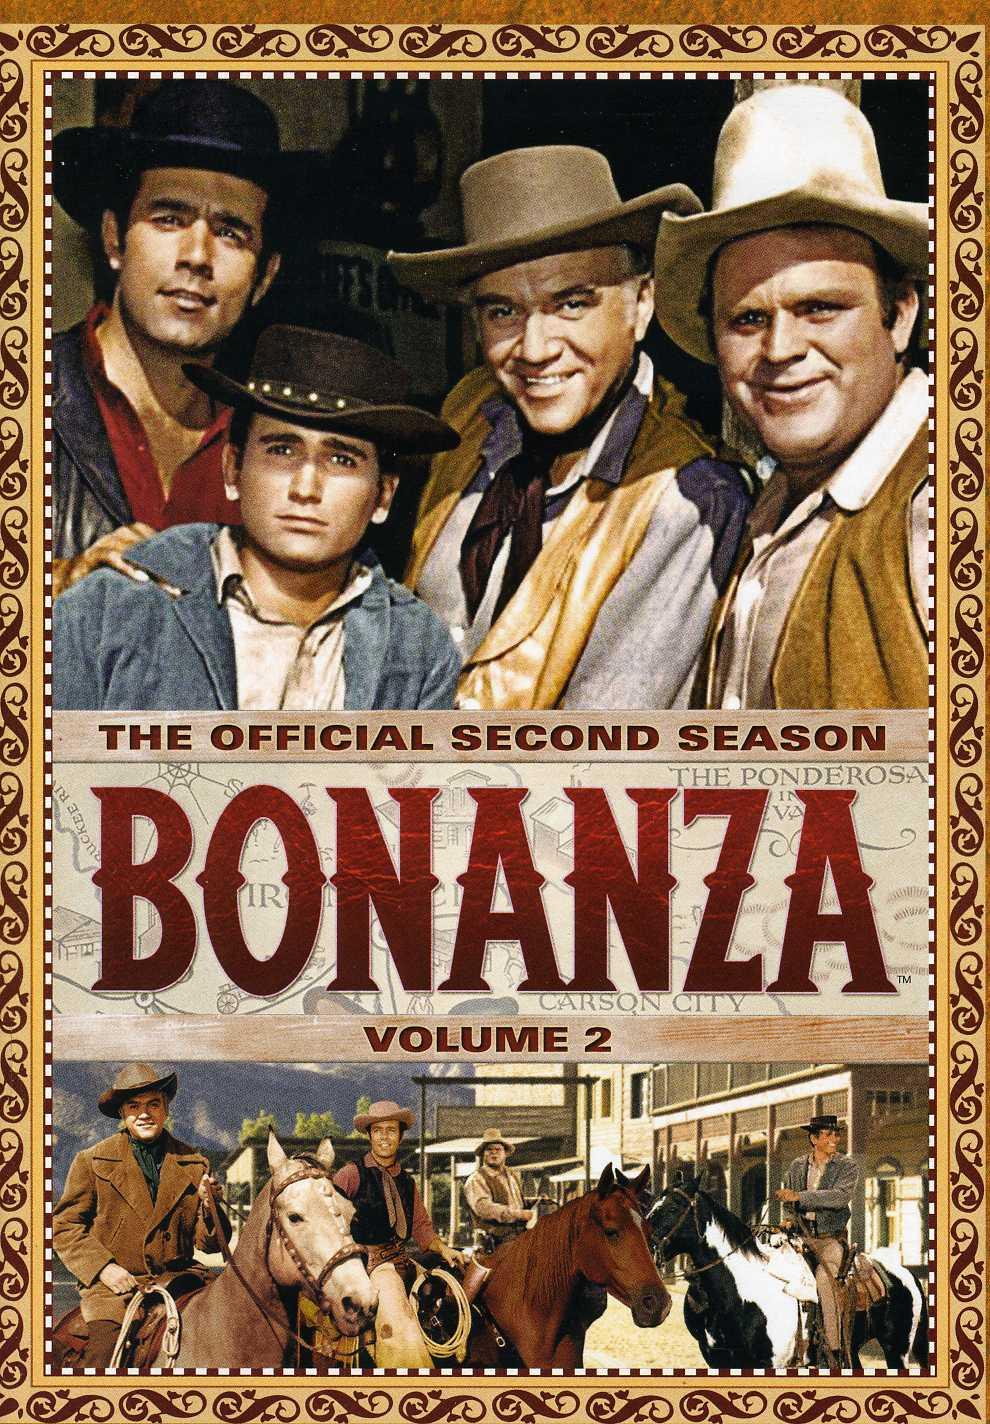 Bonanza: The Official Second Season Vol. 2 (DVD)